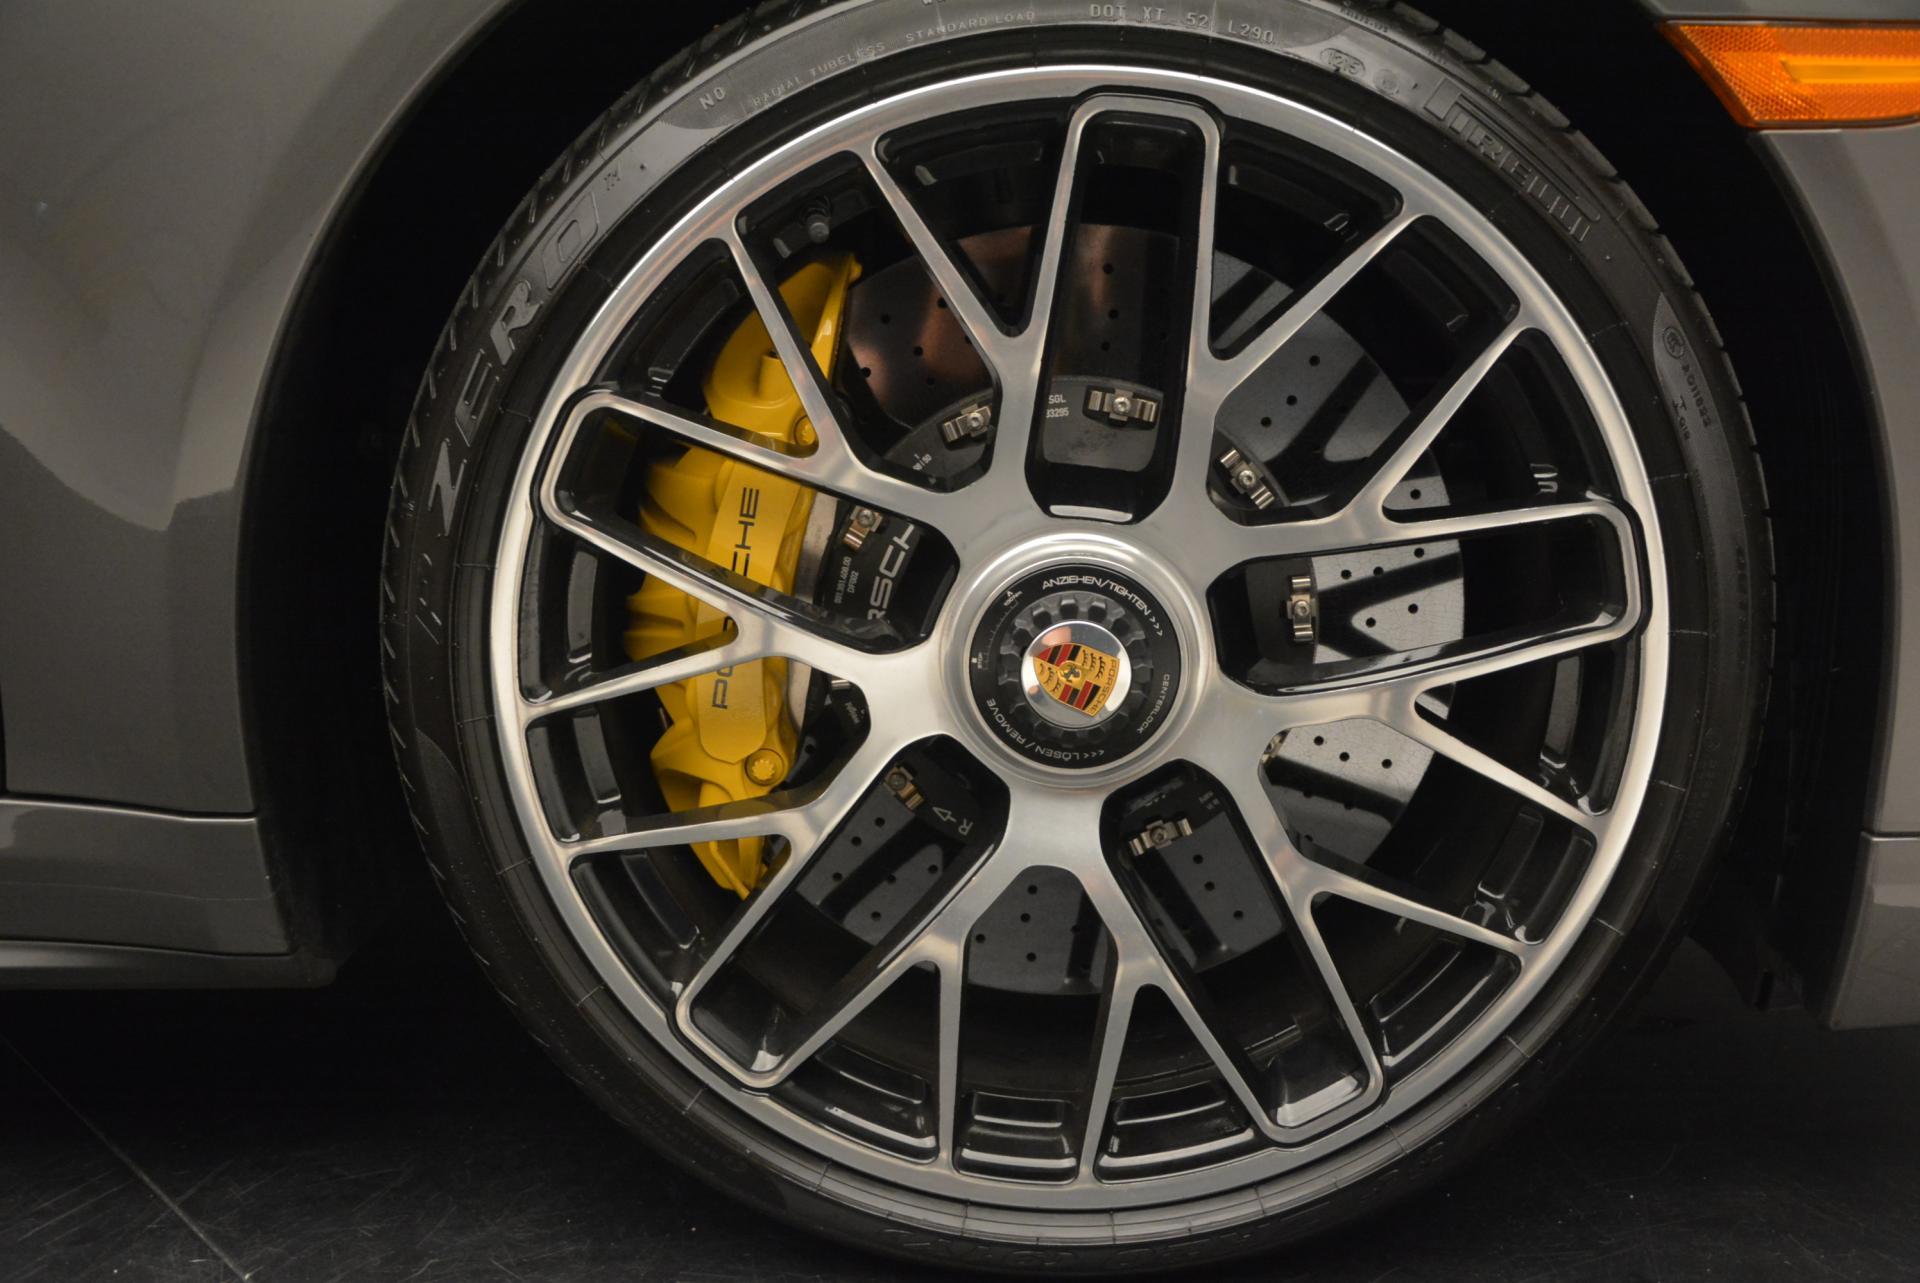 Used 2014 Porsche 911 Turbo S For Sale In Greenwich, CT 113_p25